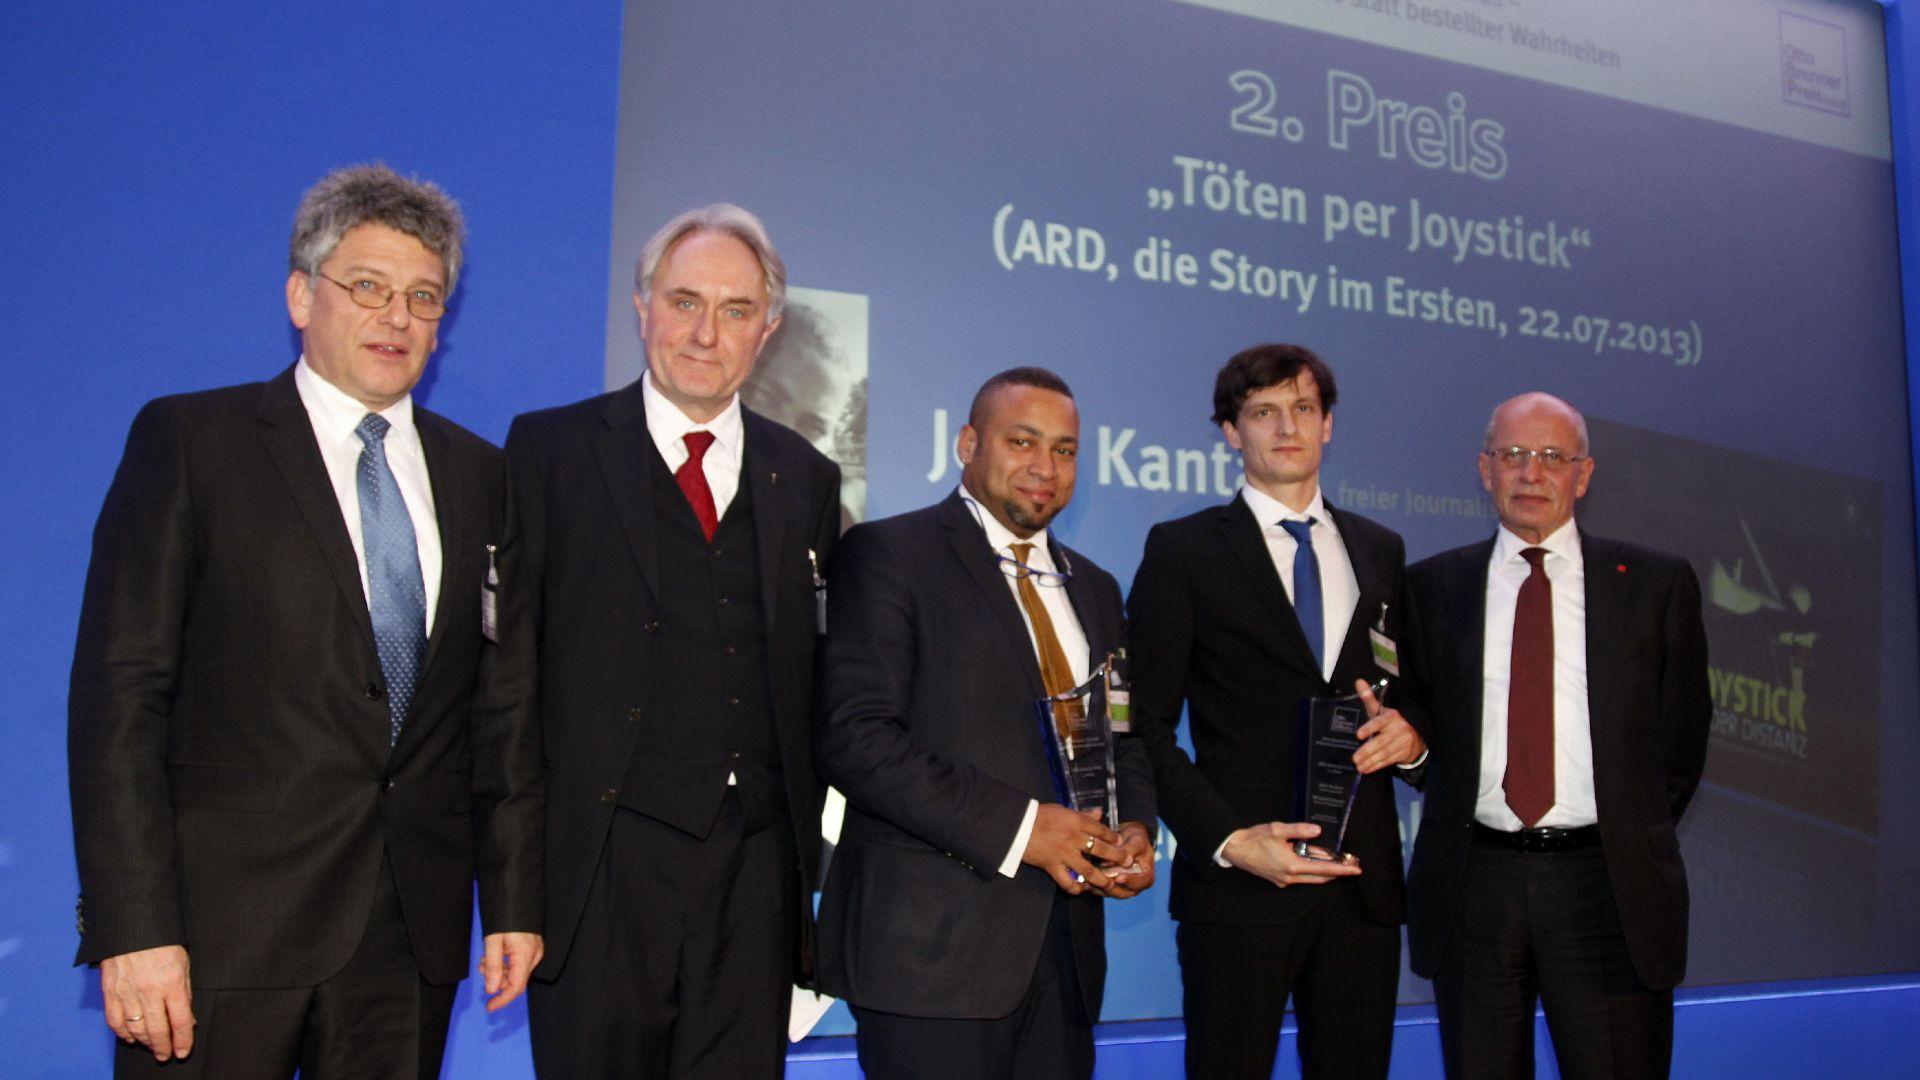 v.l.n.r. Jupp Legrand, Prof. Dr. Volker Lilienthal, Prof. John A. Kantara, Michael Fräntzel, Berthold Huber